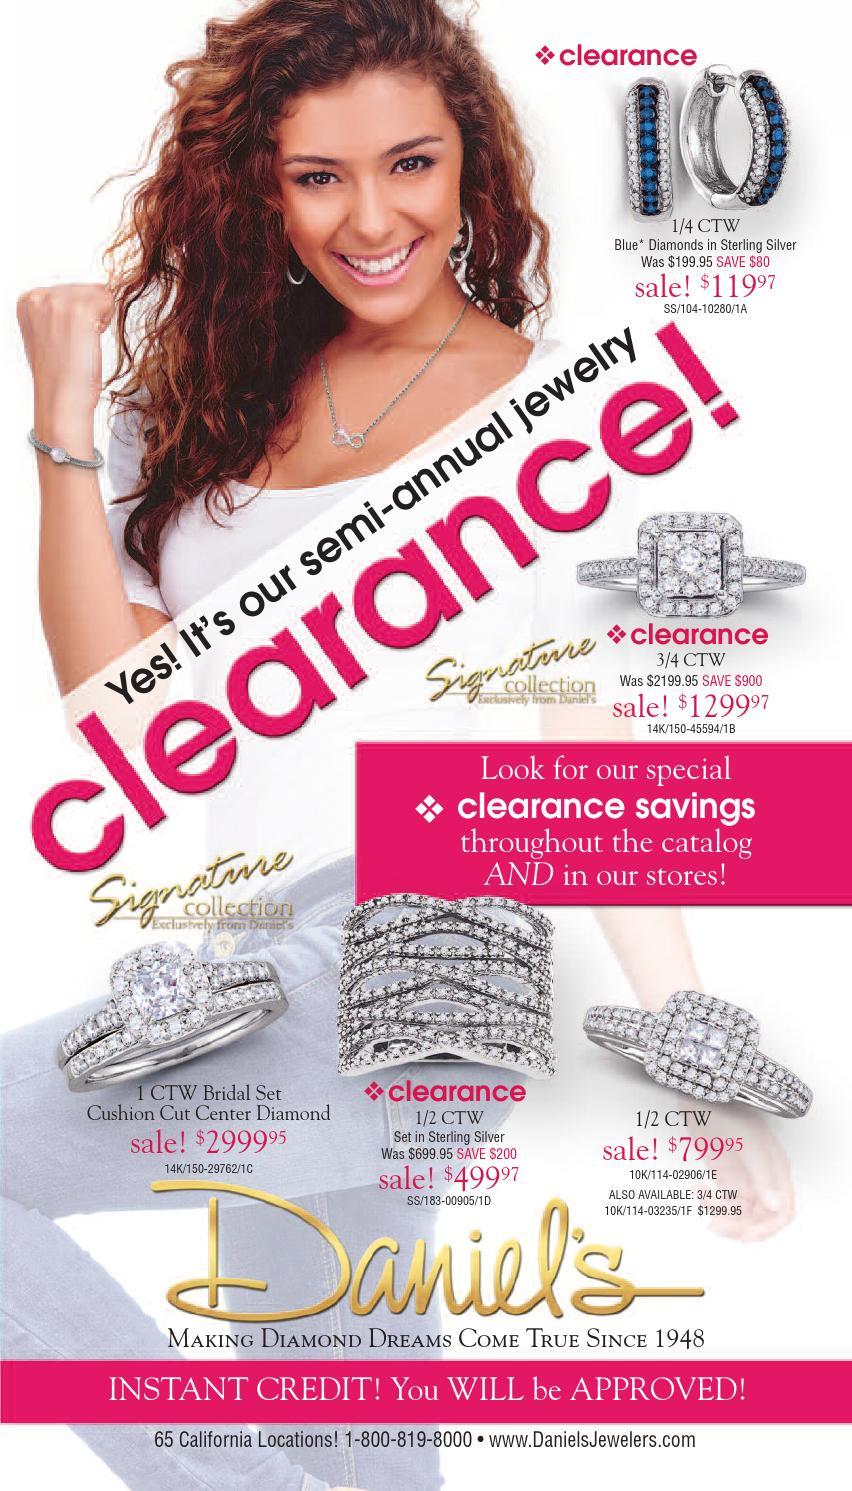 Daniels Jewelry Payment : daniels, jewelry, payment, Daniel's, Jewelers, Semi-Annual, Jewelry, Clearance, Issuu